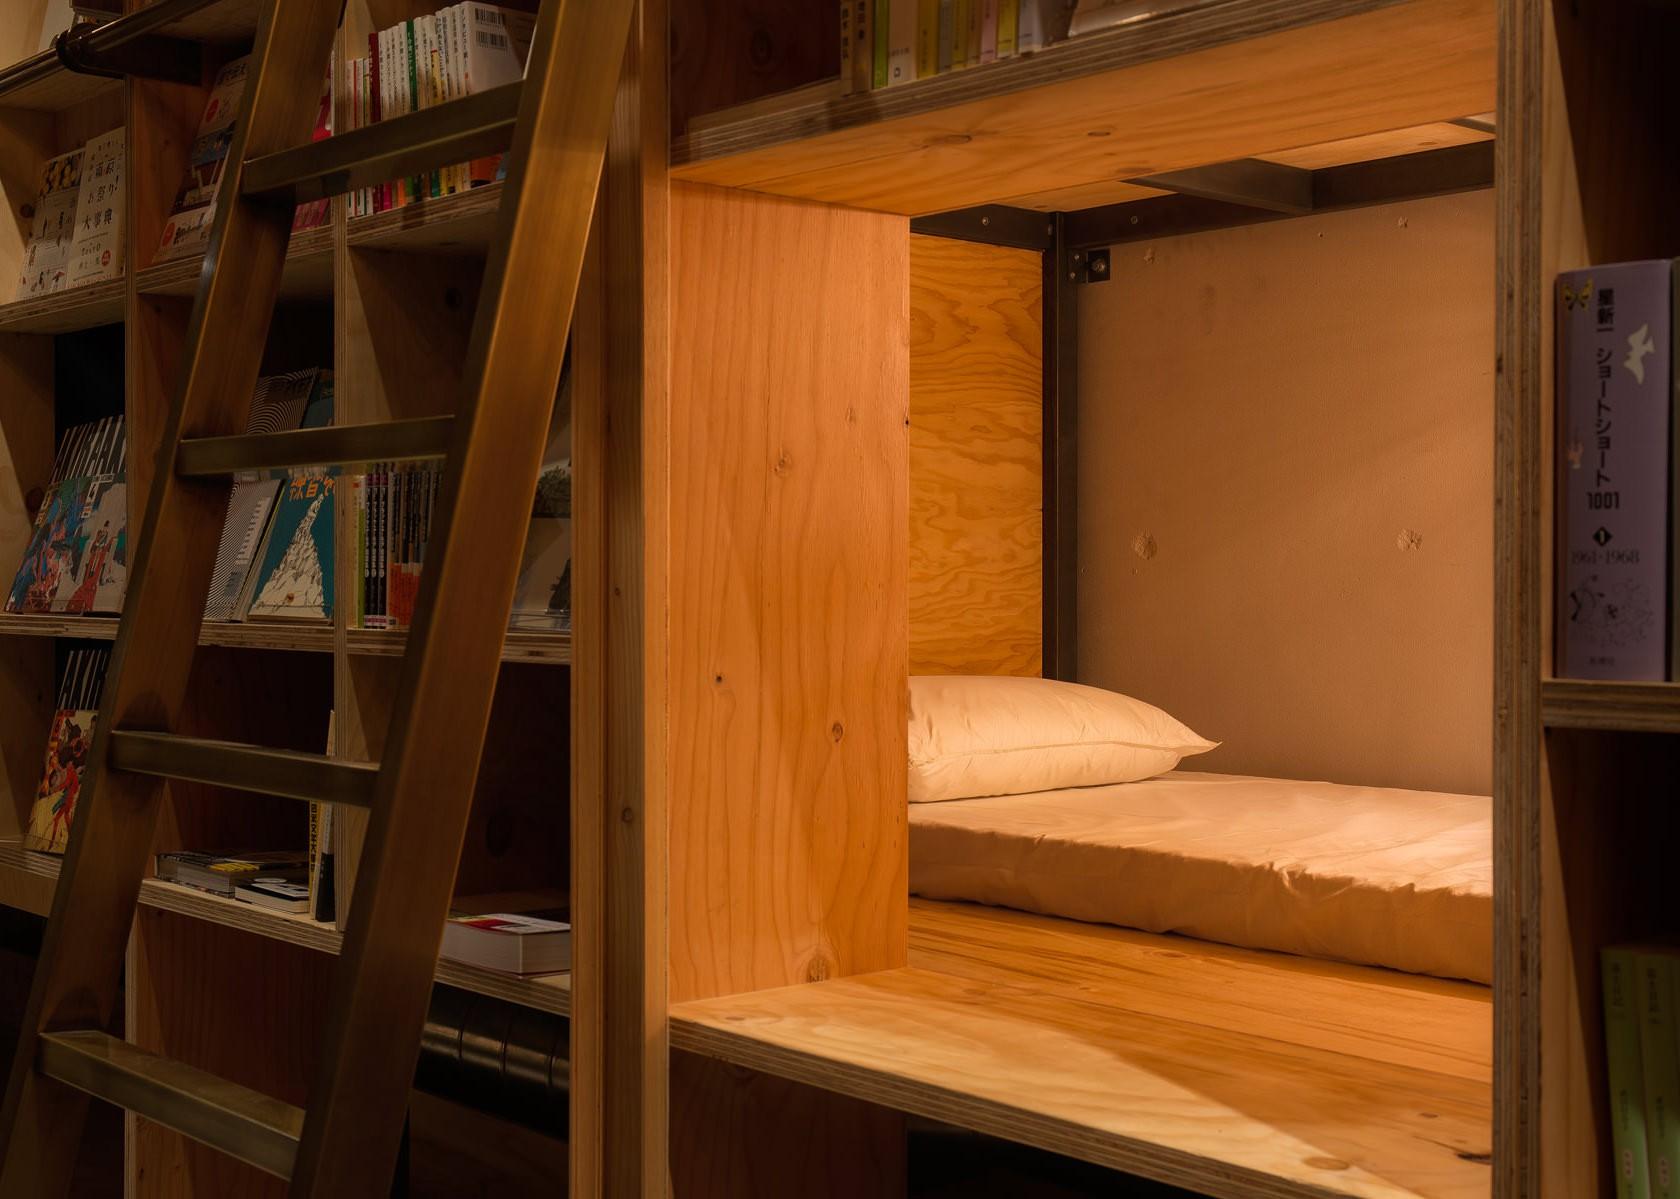 lit de book and bed